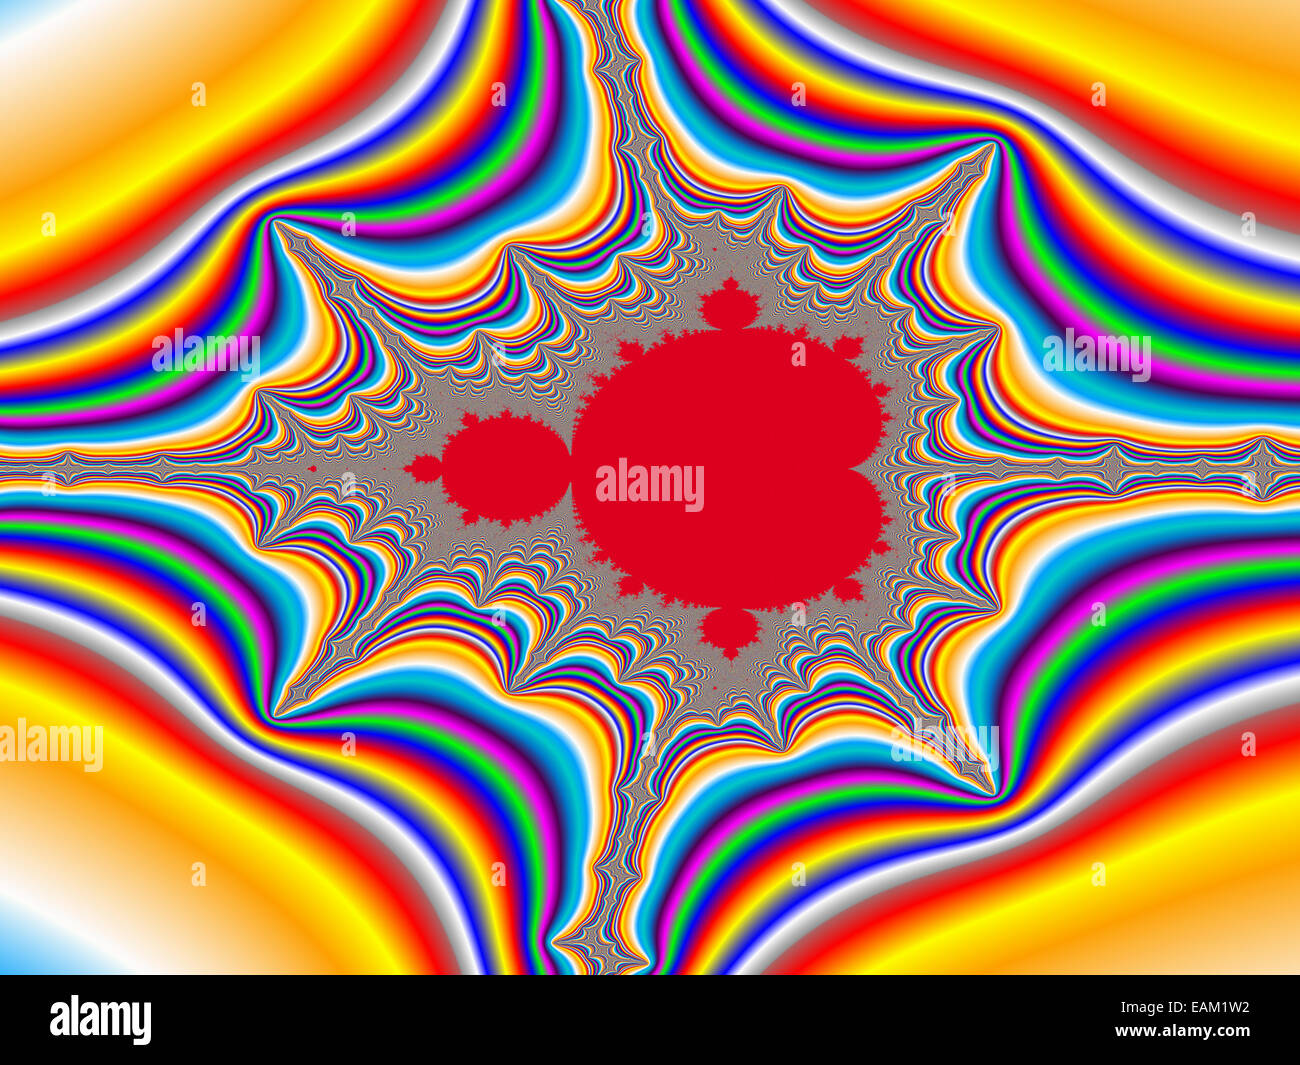 Digital visualization of a colourful fractal called Mandelbrot set. Mathematical Background - Stock Image